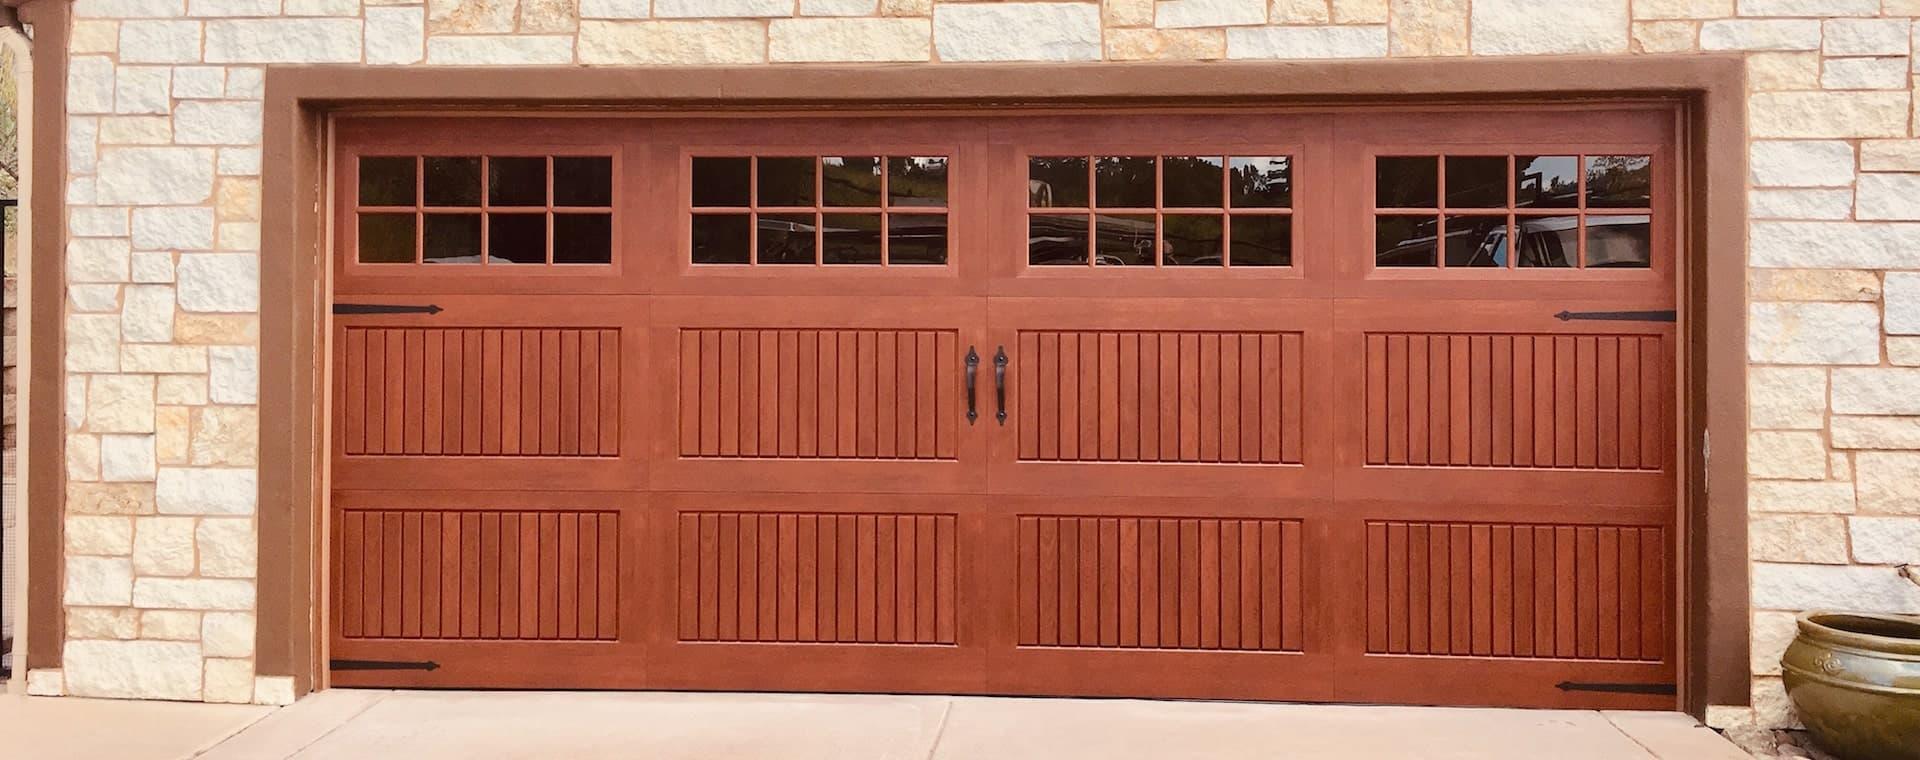 San Diego Garage Door Installation, San Diego Garage Door ...